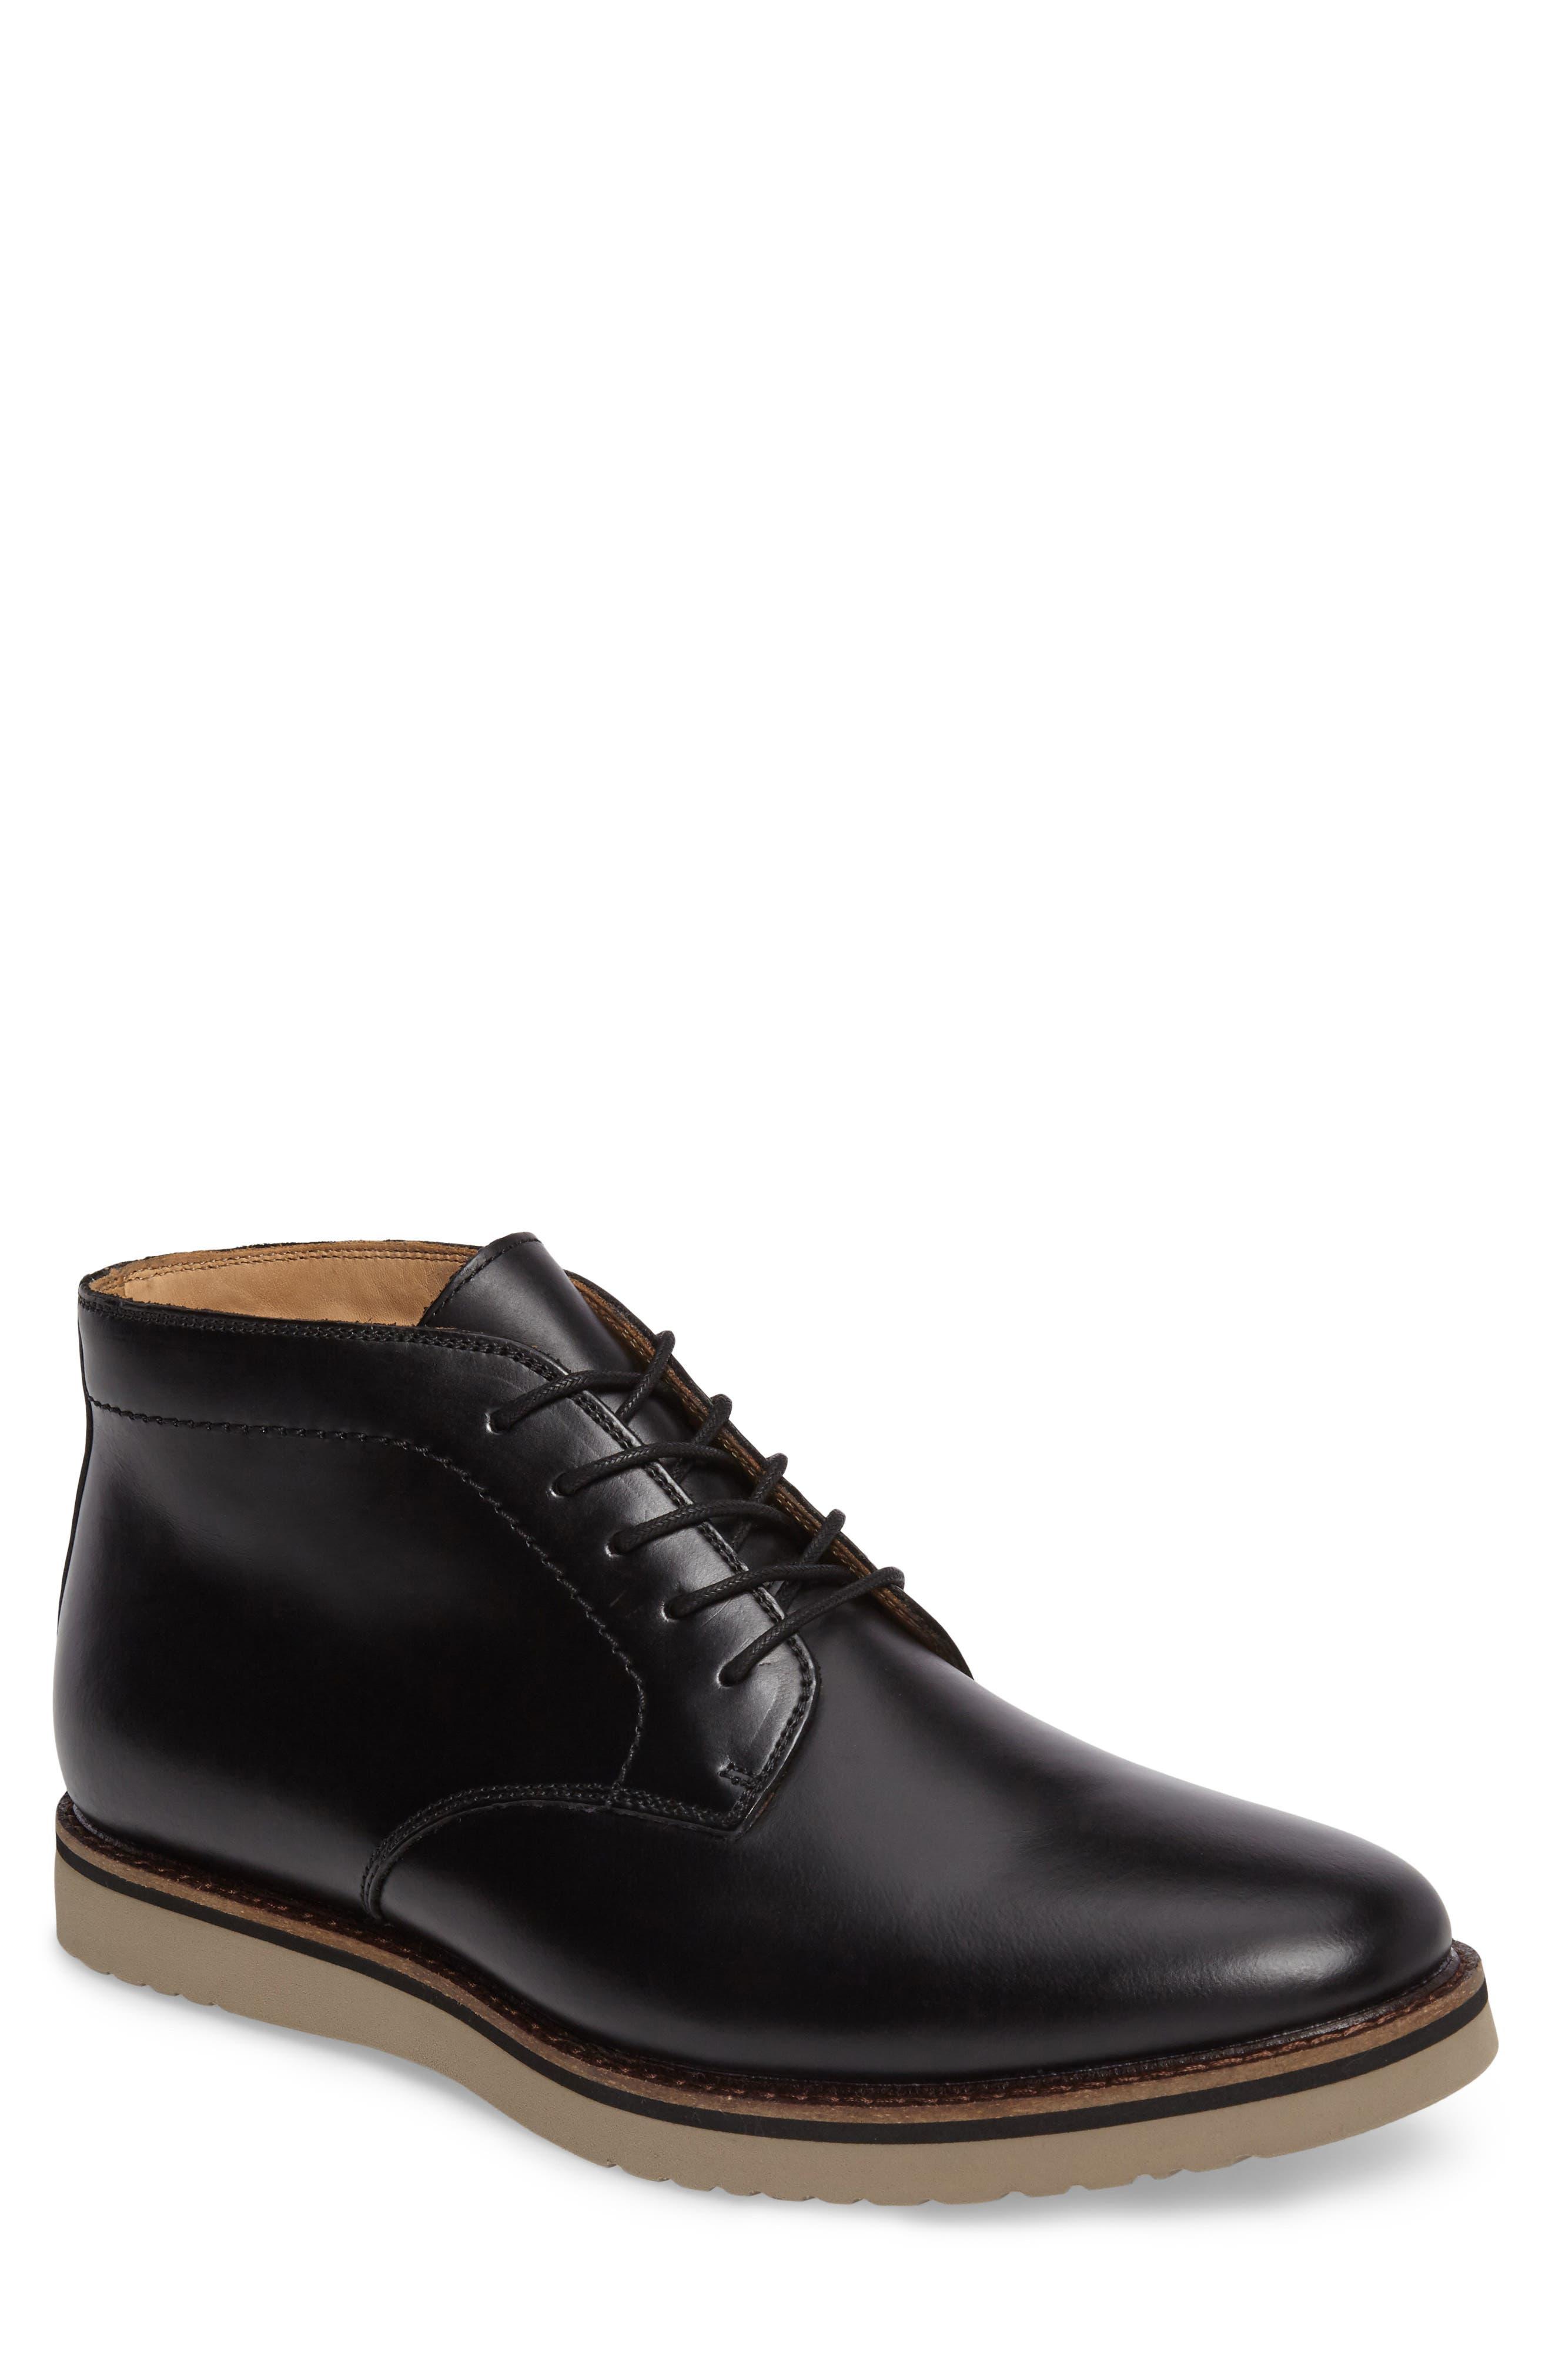 j shoes farley chukka boot nordstrom